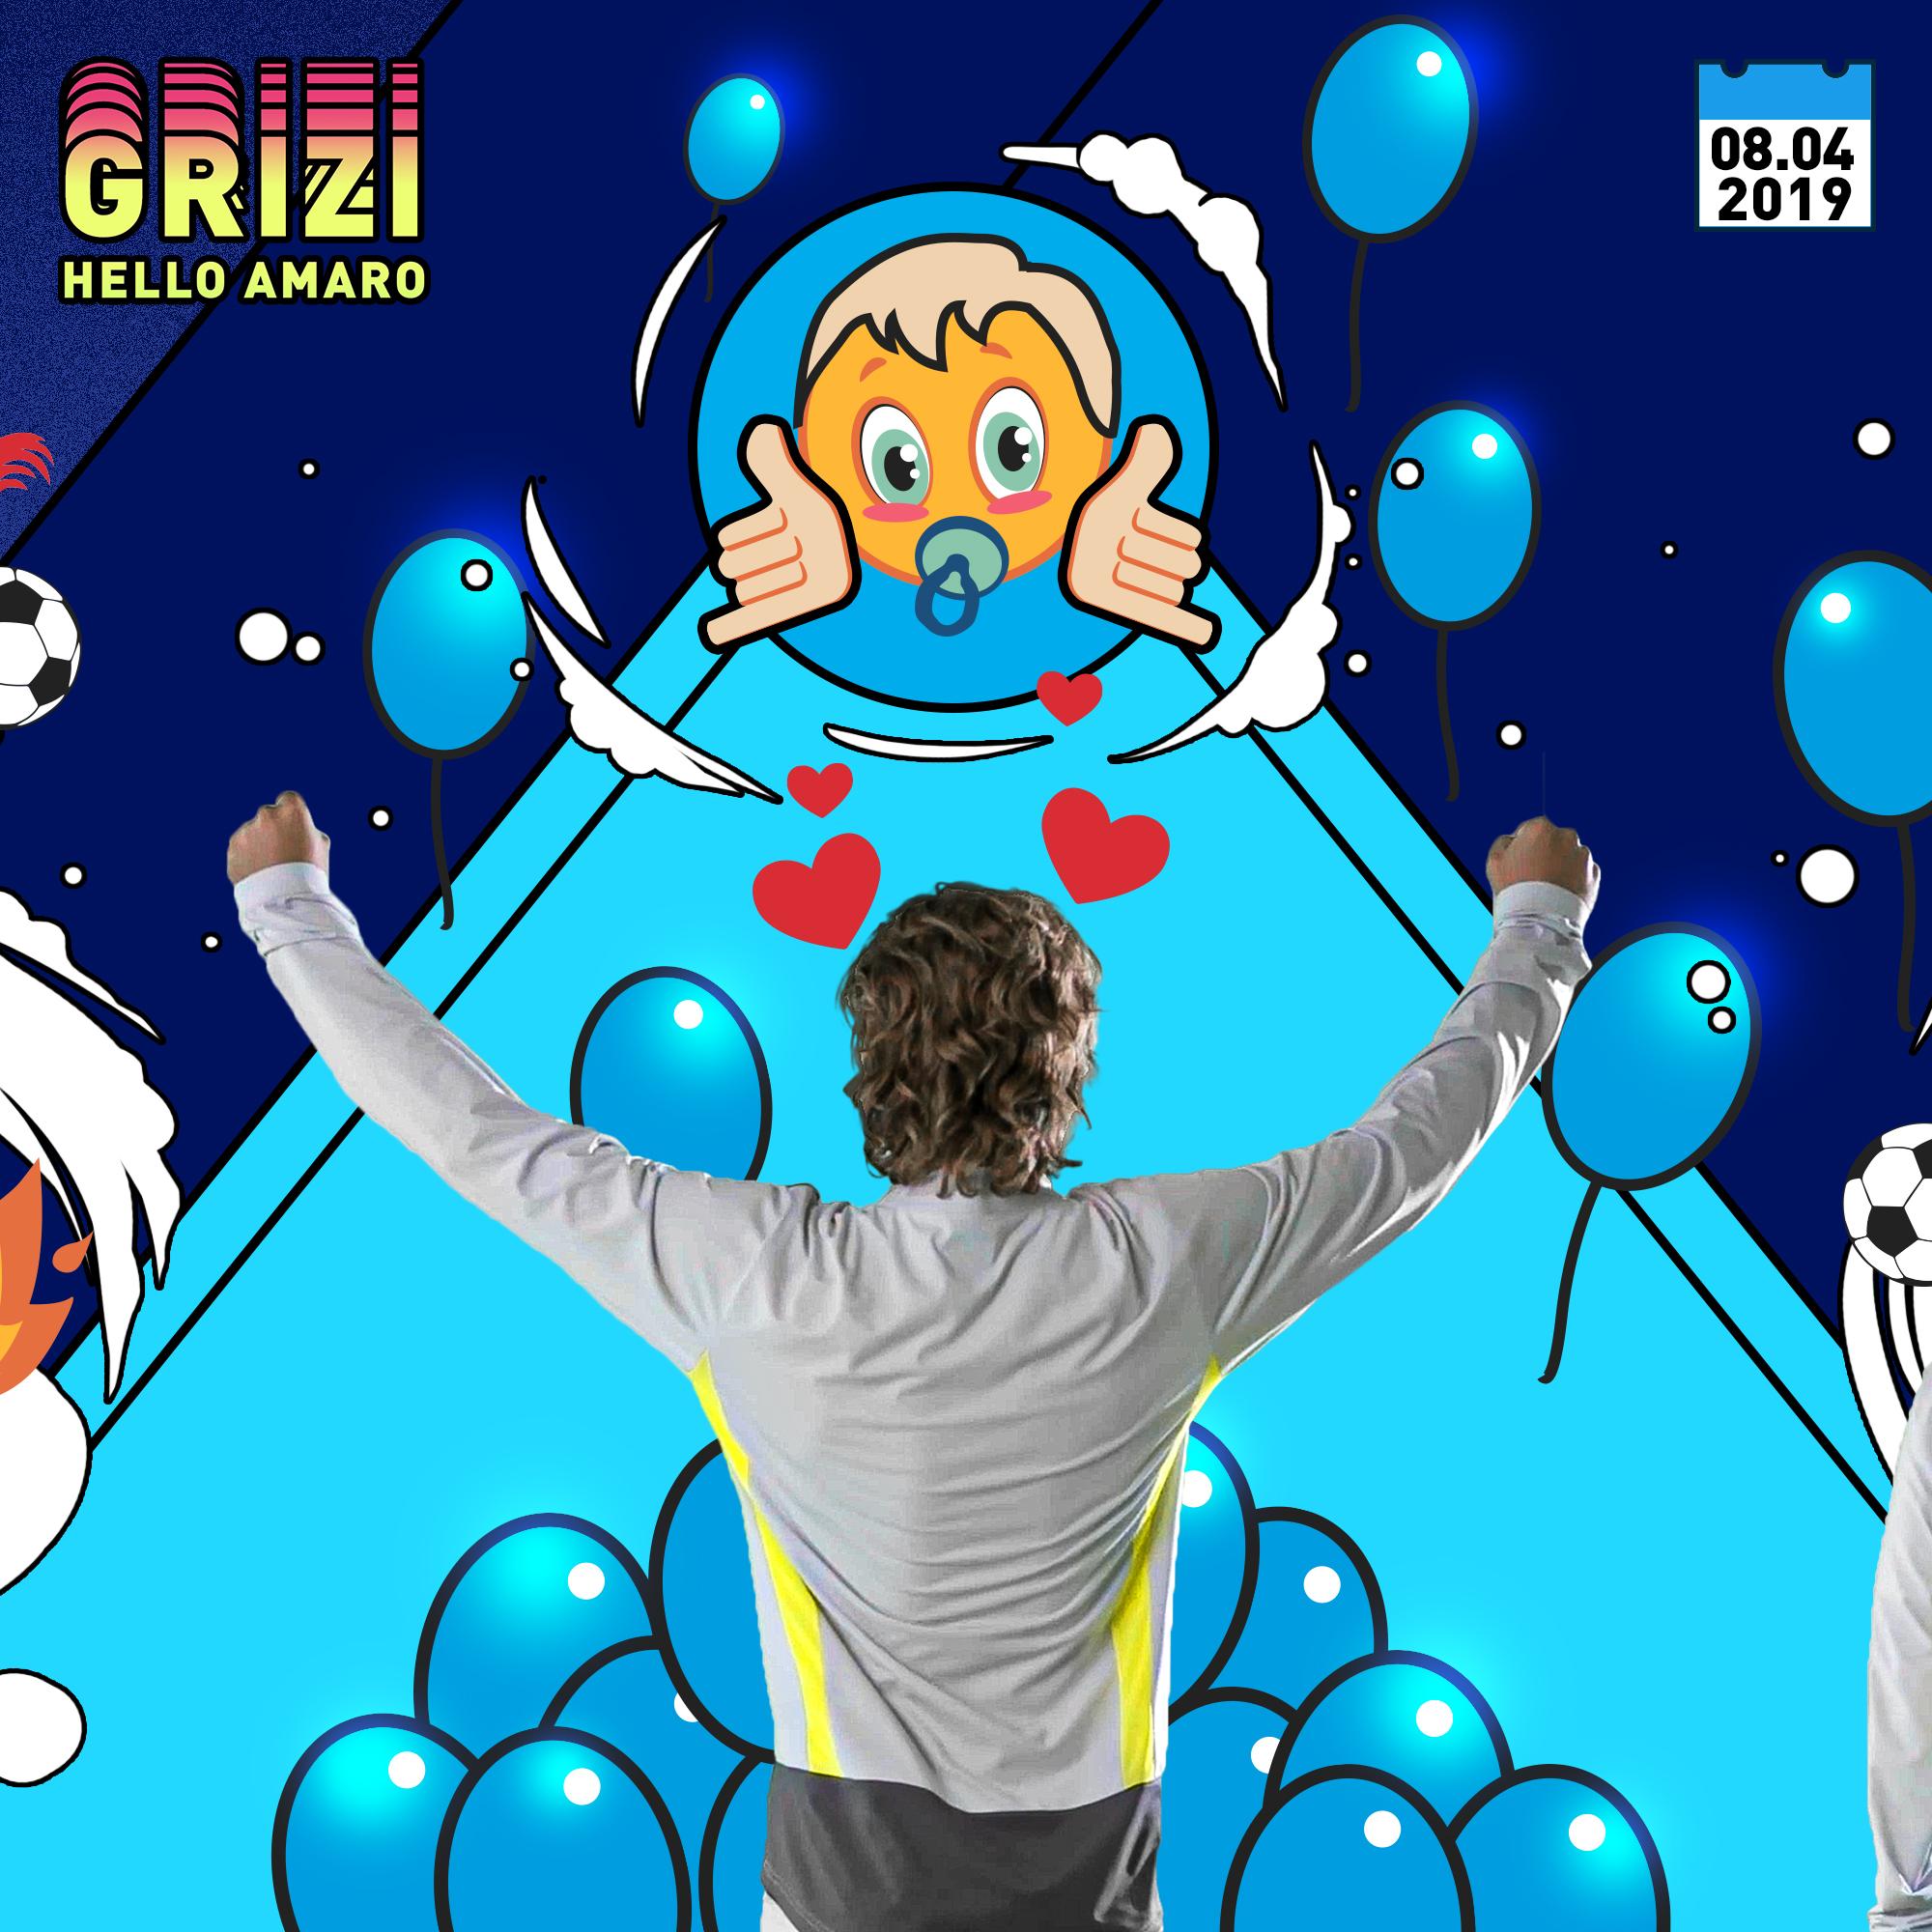 19AW_Social_IG_TS_Football_Griezmann-Special-Edition_FUTURE_Q4_2000x2000_009.jpg